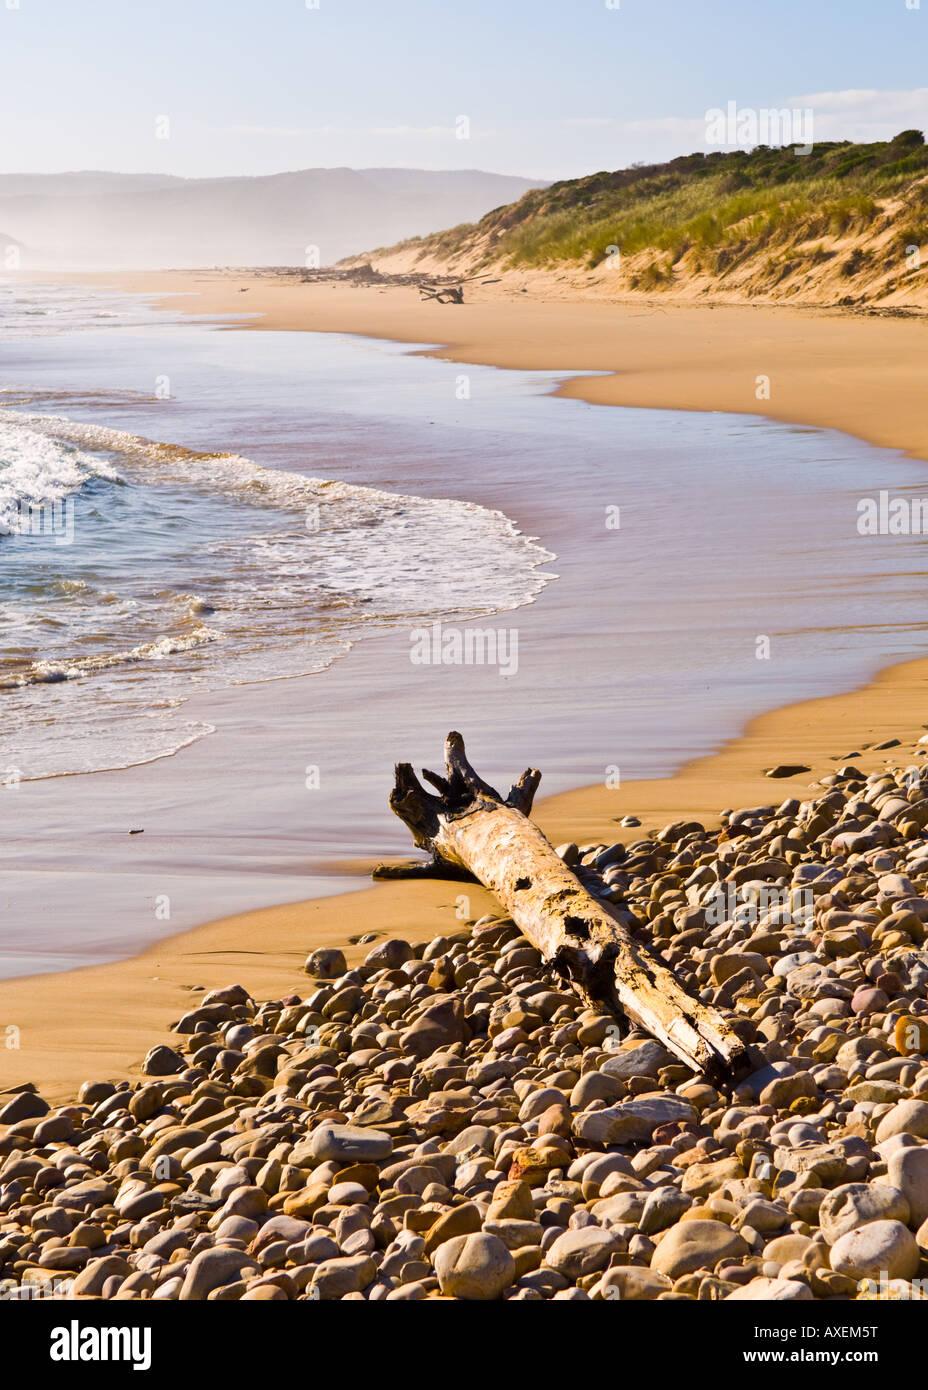 Driftwood on beach. Buffelsbaai. - Stock Image